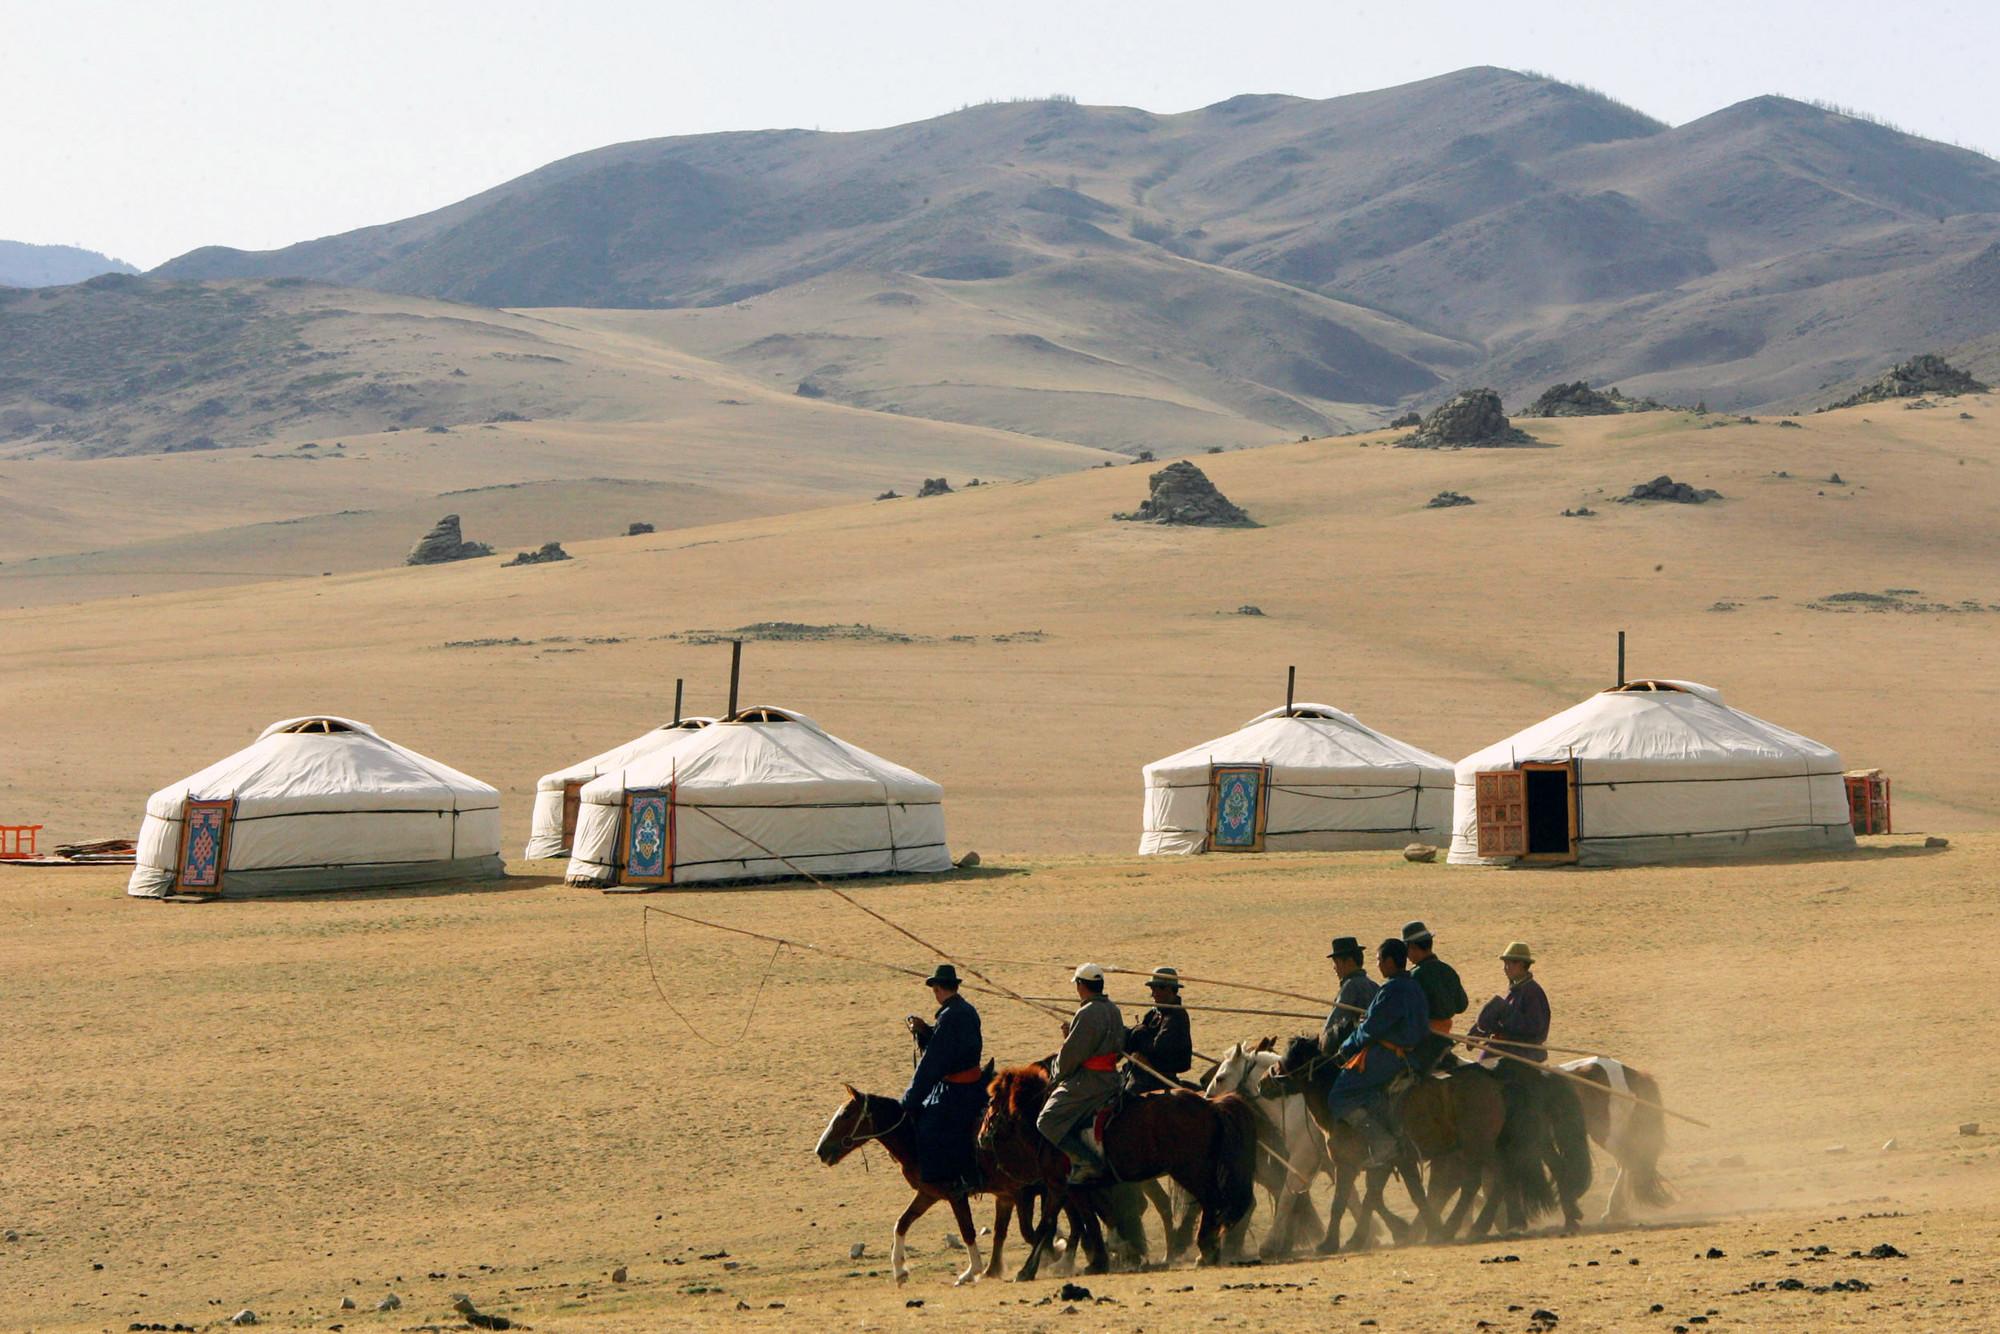 Arquitectura Verncula Yurtas Viviendas Nmades en Mongolia  Plataforma Arquitectura